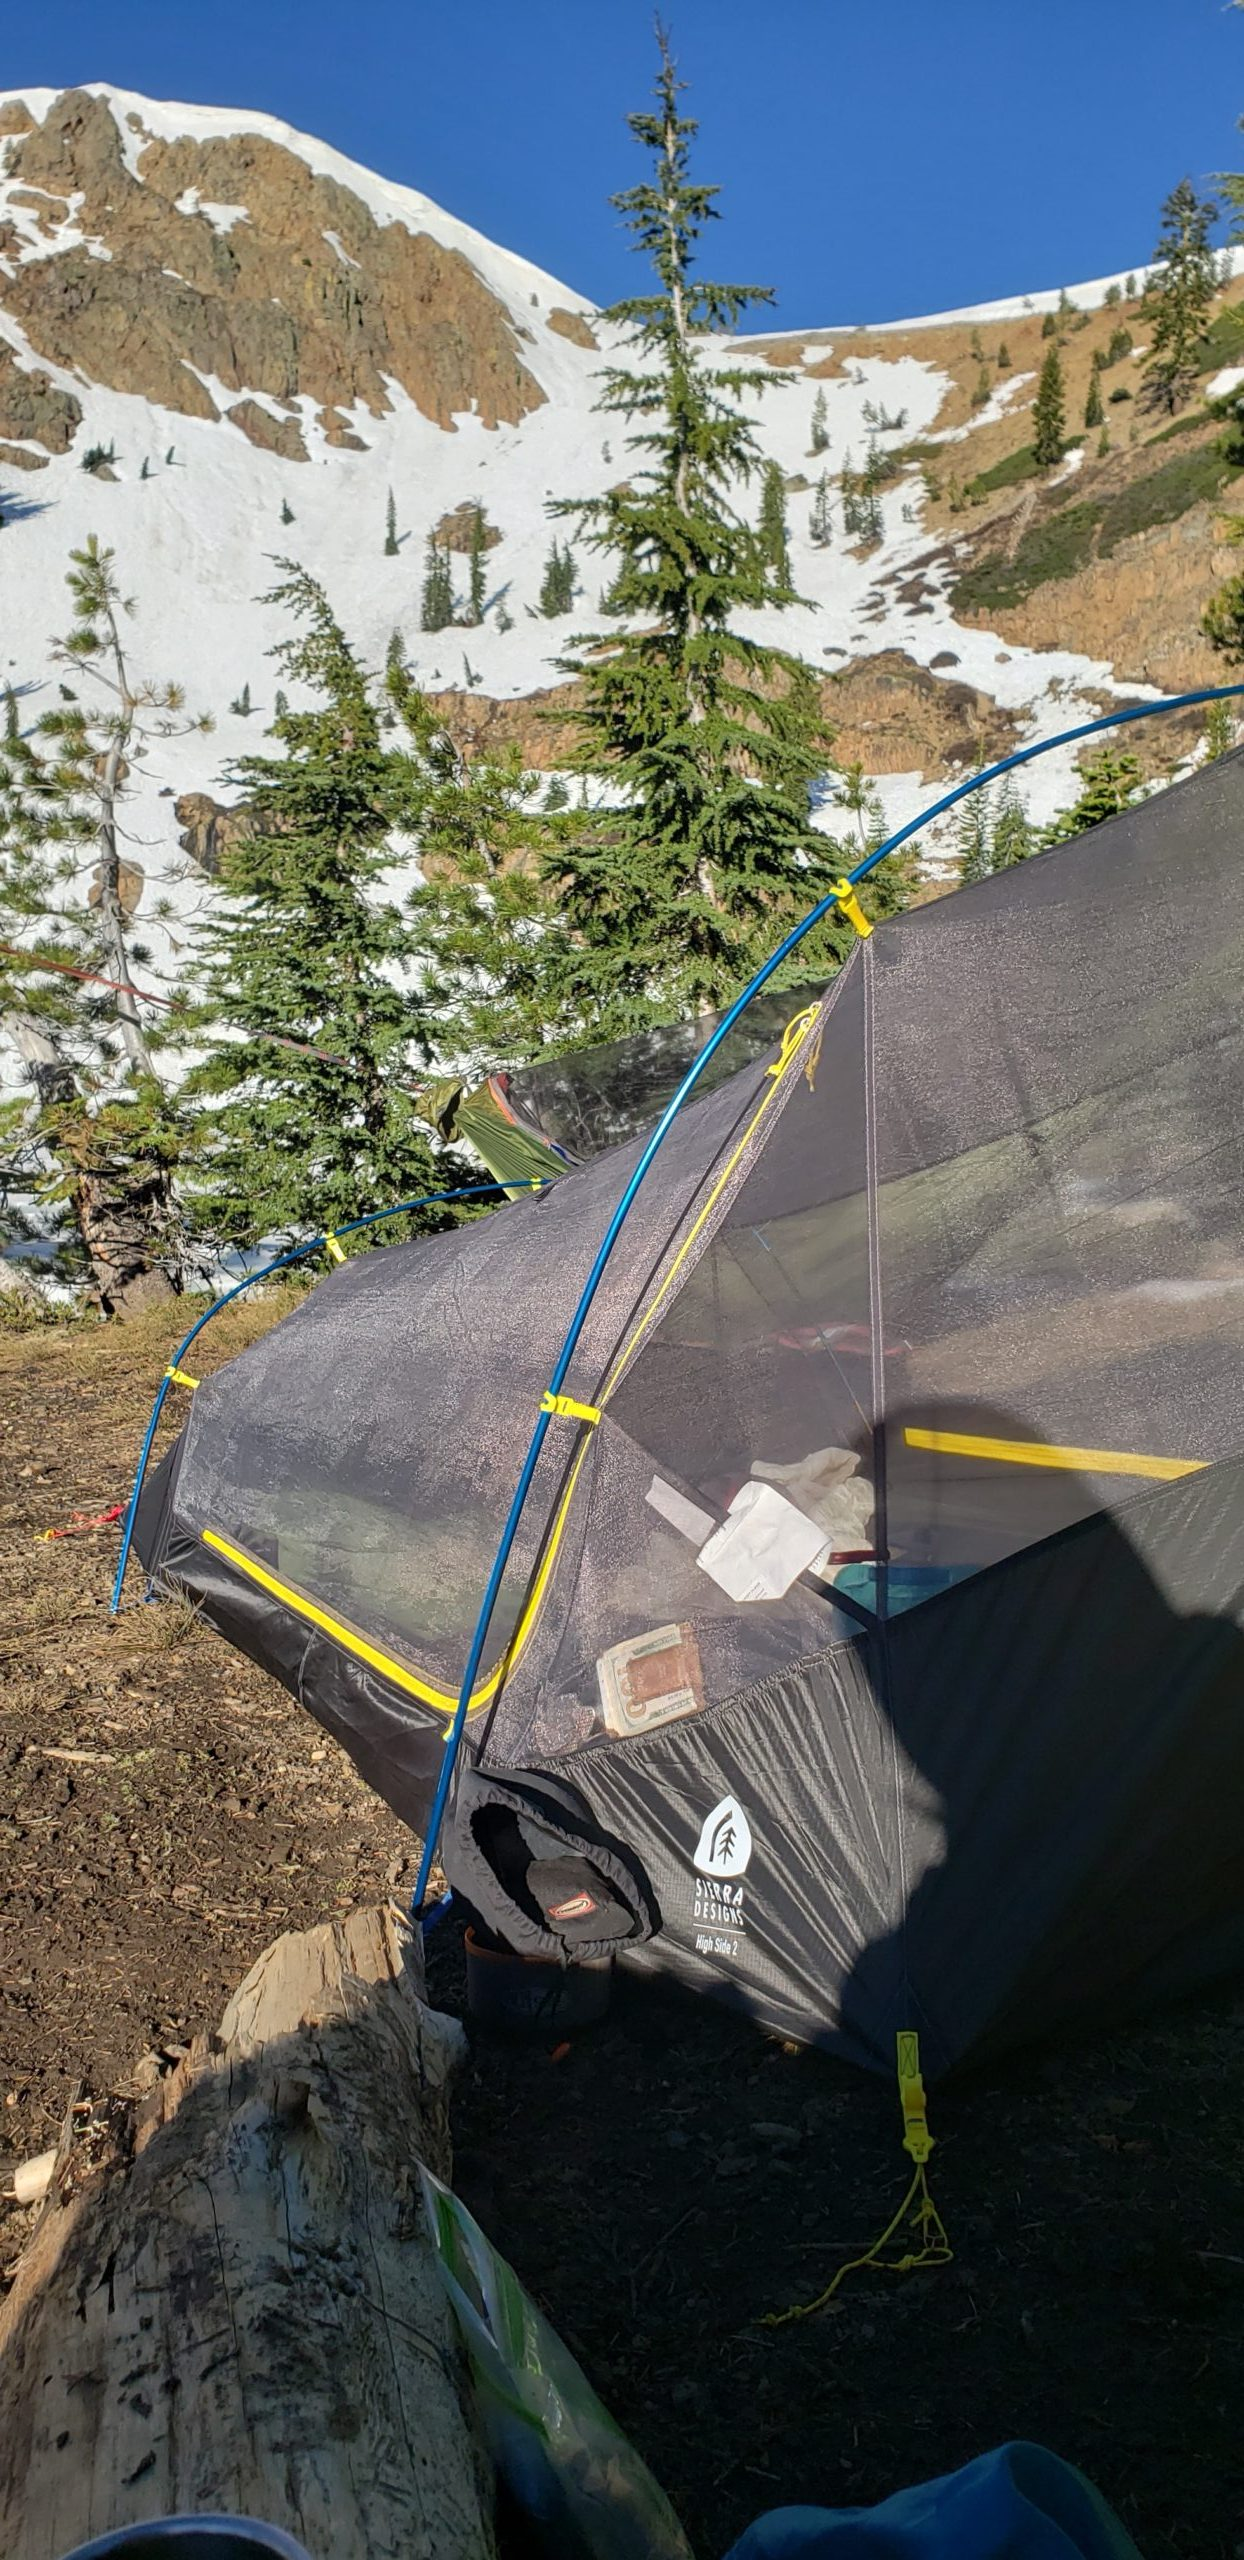 Sierra Designs Tent Length